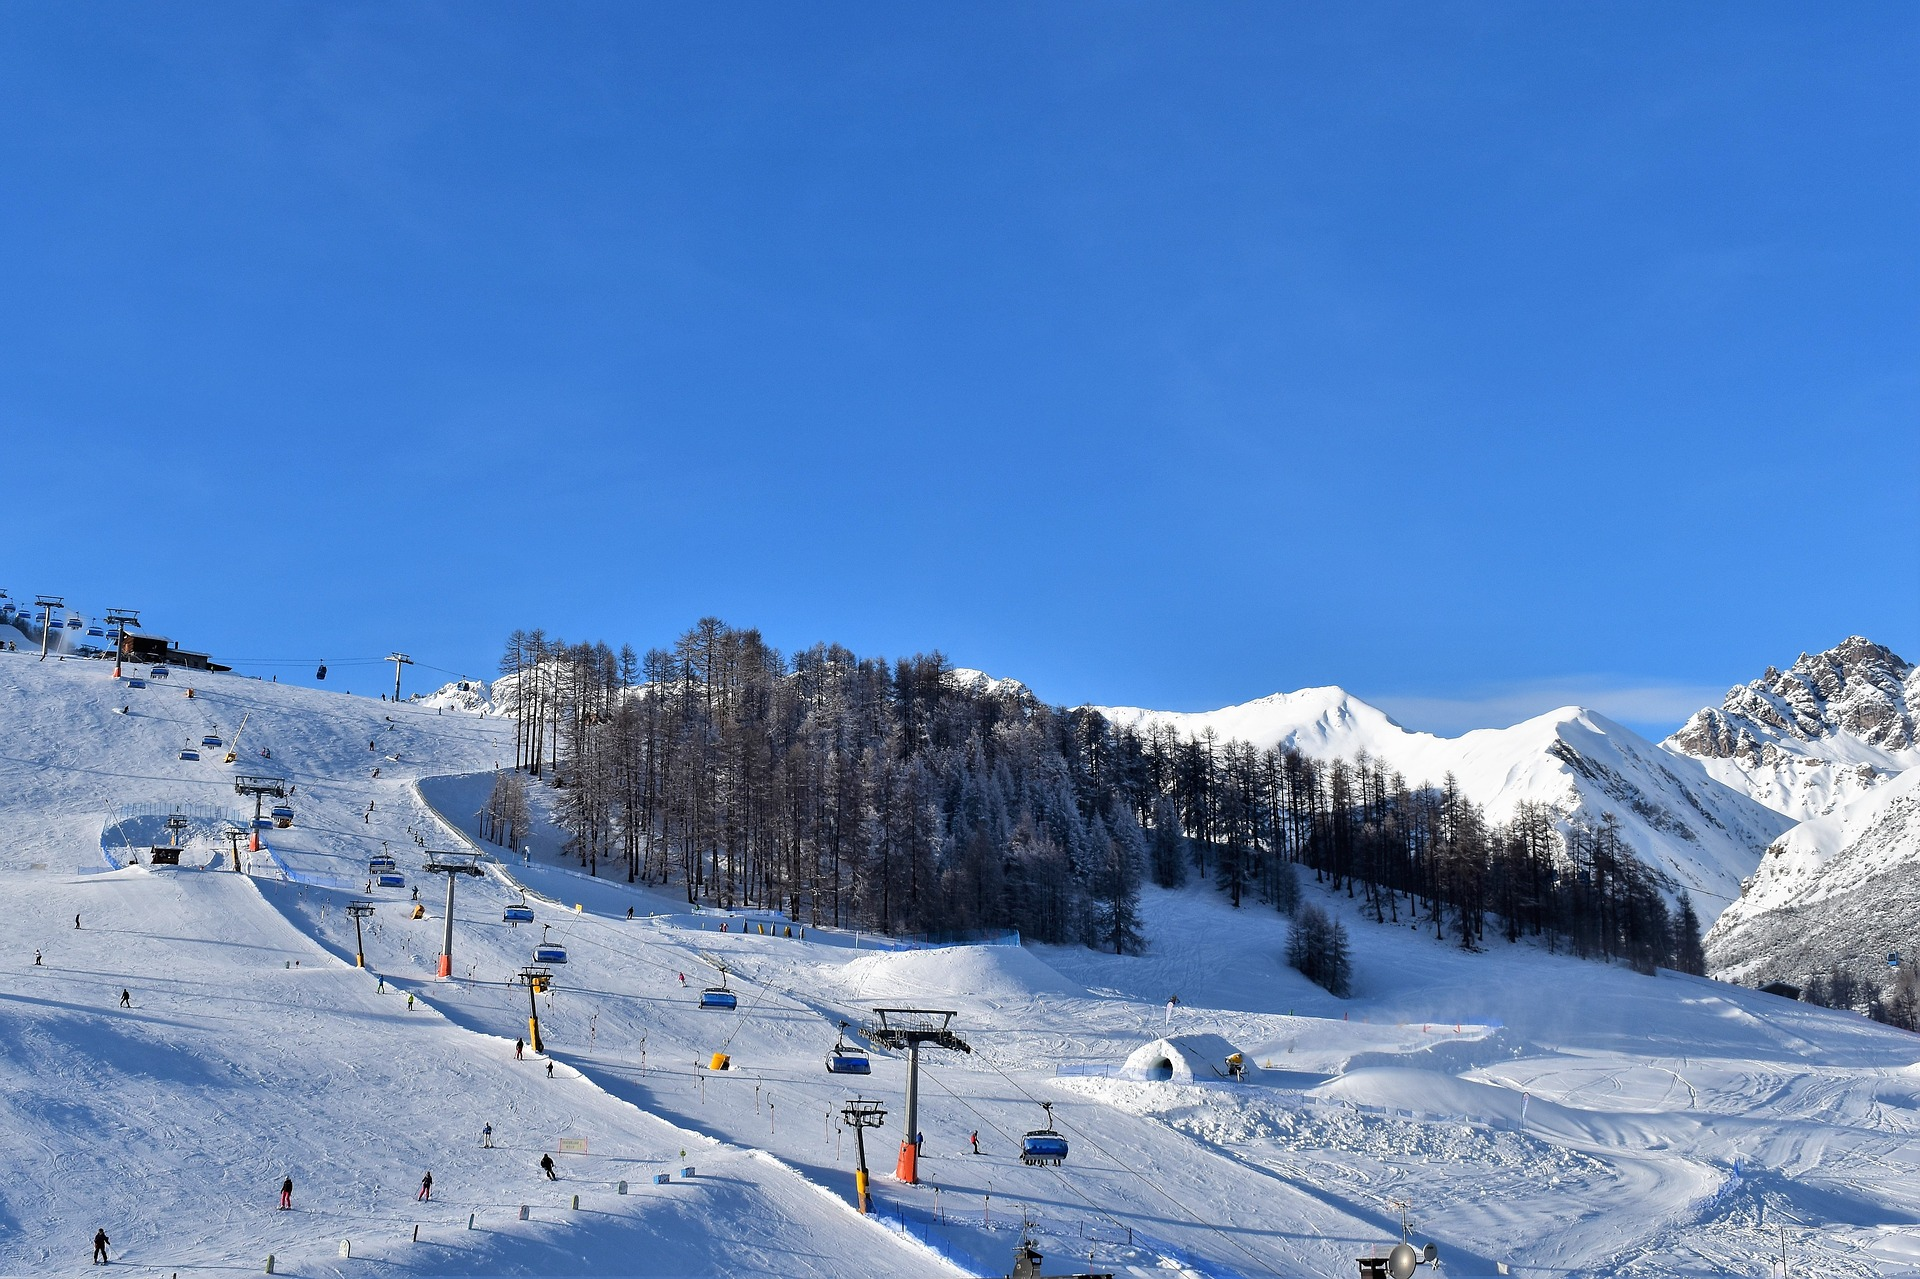 https://pixabay.com/ja/実行スキー-スキーリフト-スキー-雪砲-雪-風景-冬-自然-3901020/